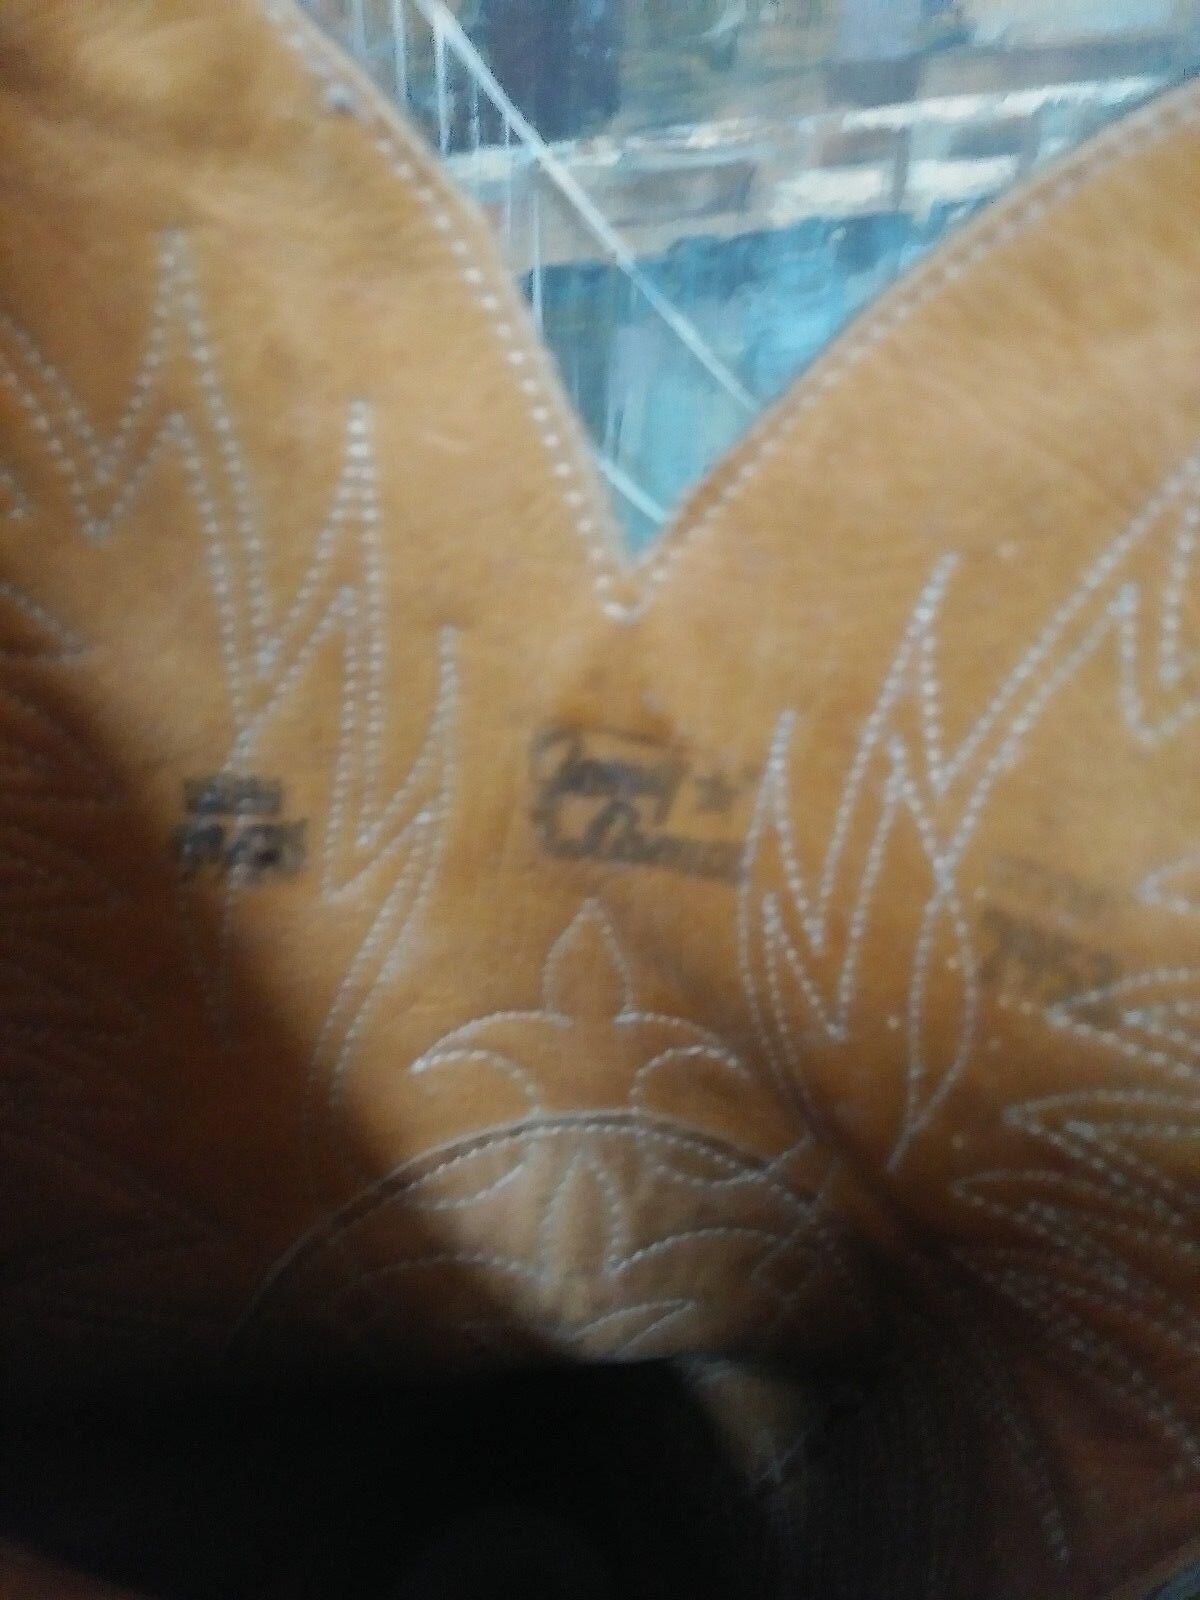 MEN'S TONY LAMA VAQUERO BULLHIDE GRAY 2953 LEATHER Stiefel SIZE 9.5D 2953 GRAY 6bf187